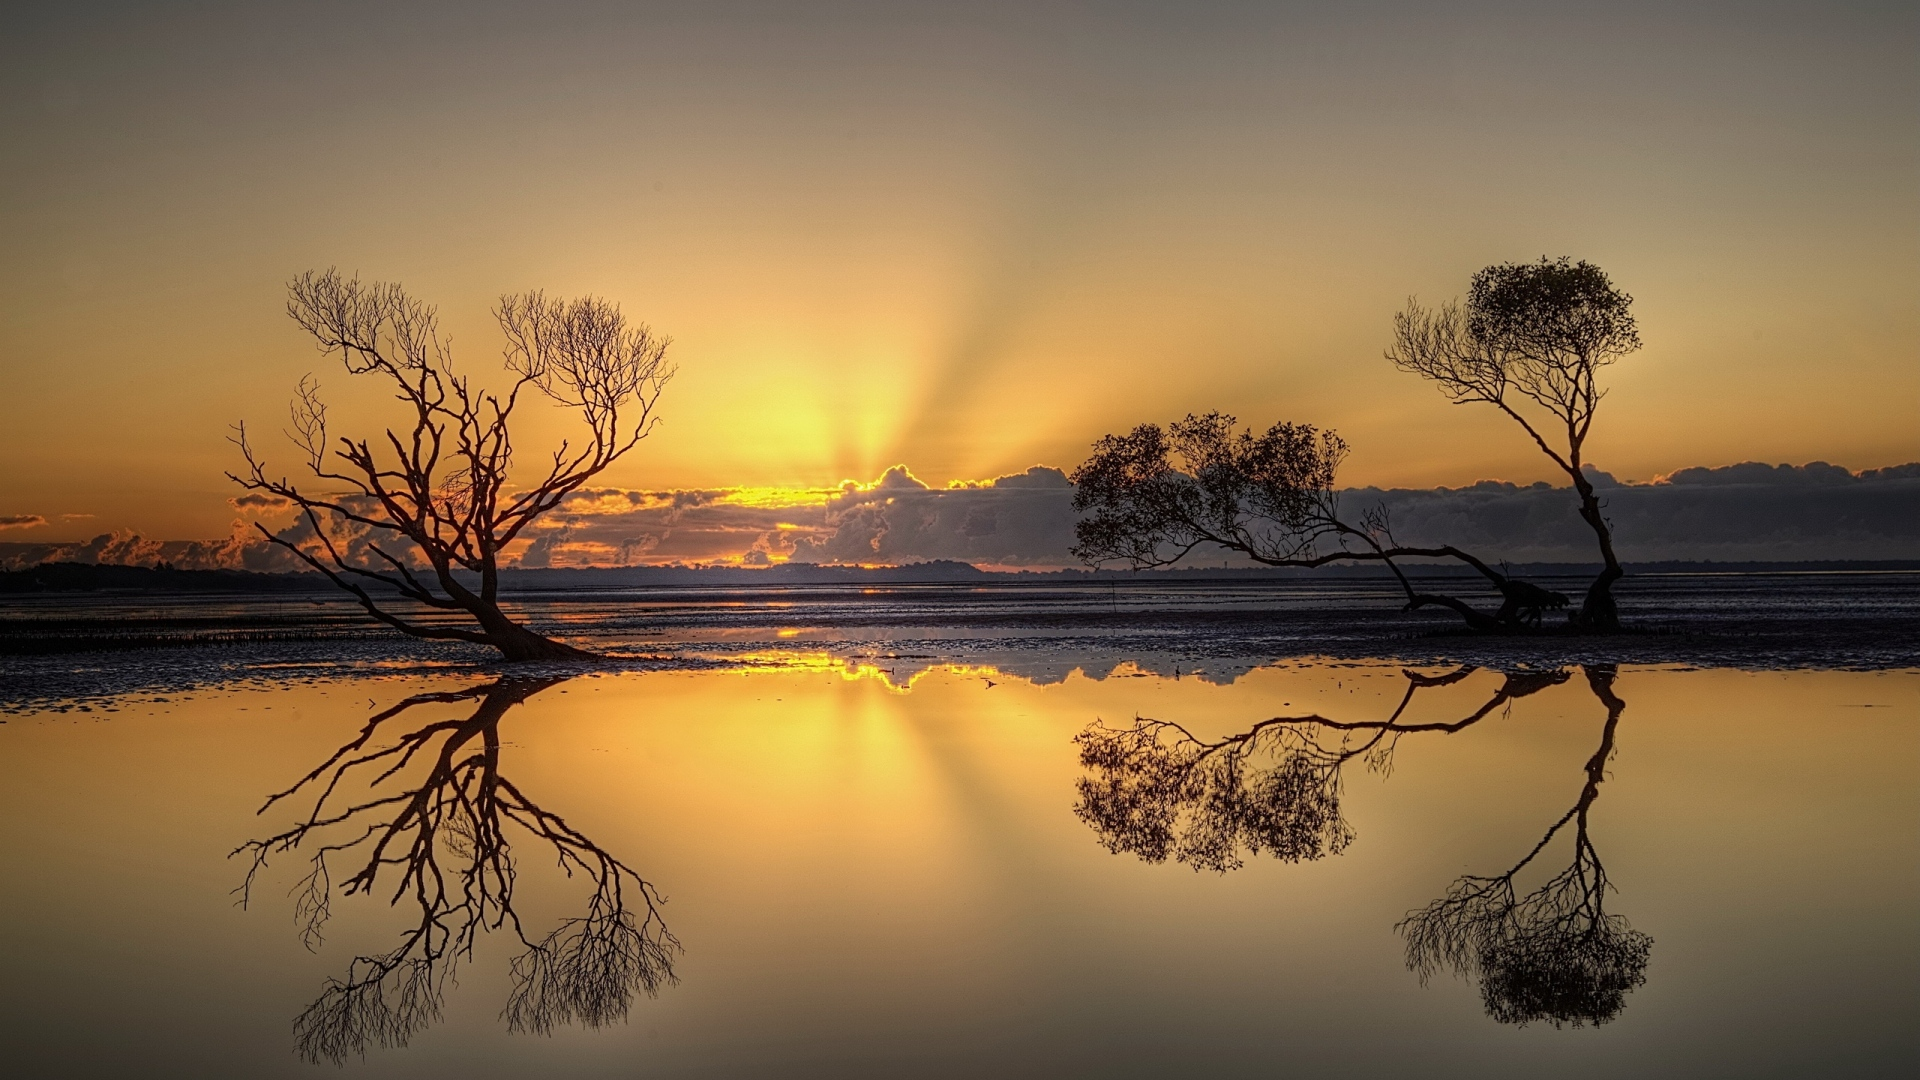 1920x1080-trees-reflection-decline-light-clouds-sky-wallpaper-wp340967